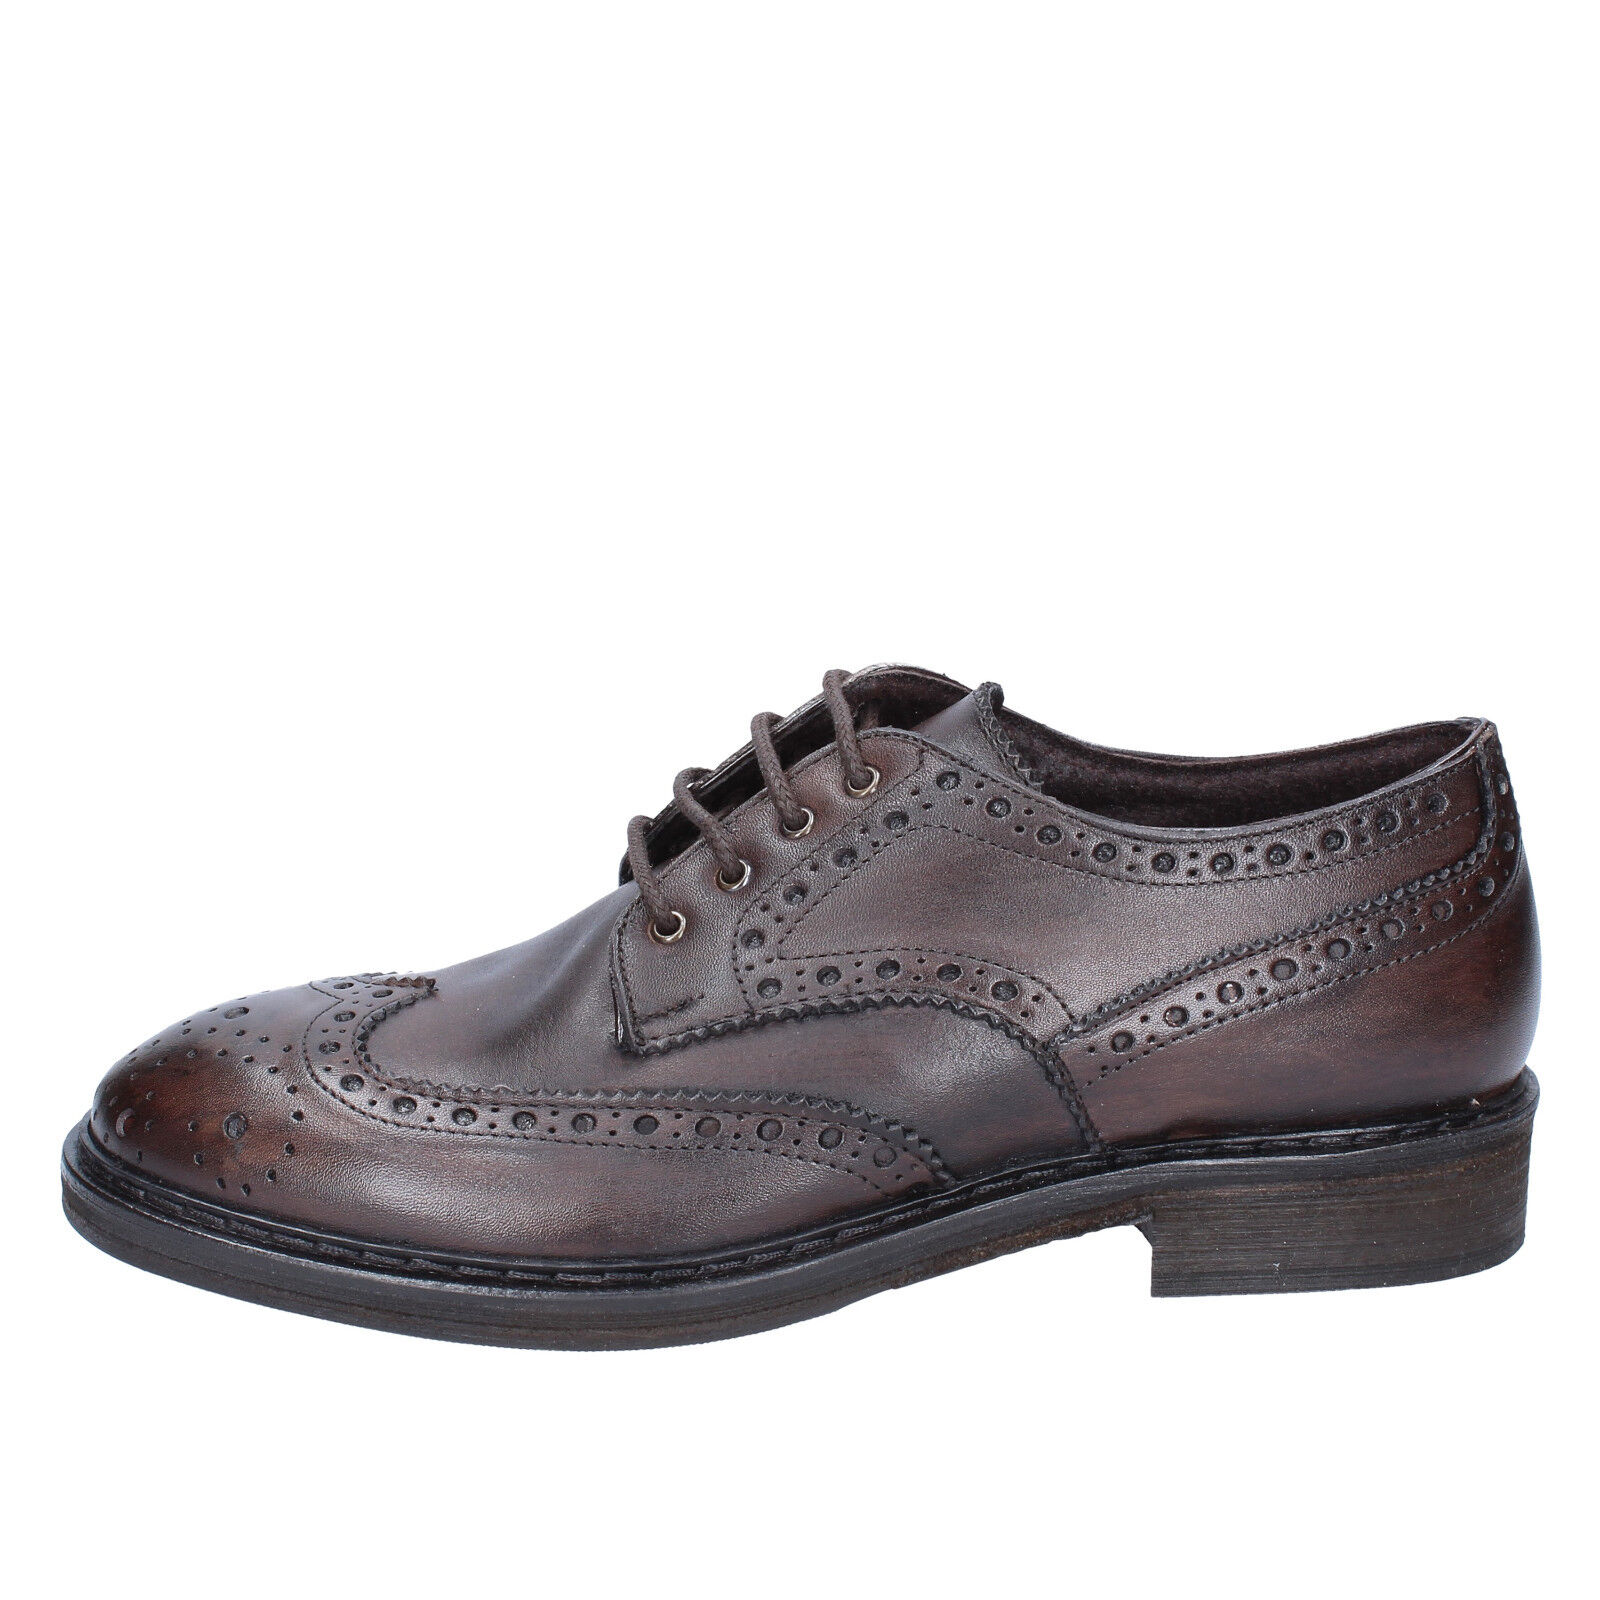 scarpe uomo CESARE MAURIZI pelle 41 EU classiche marrone pelle MAURIZI BX505-41 c08d60